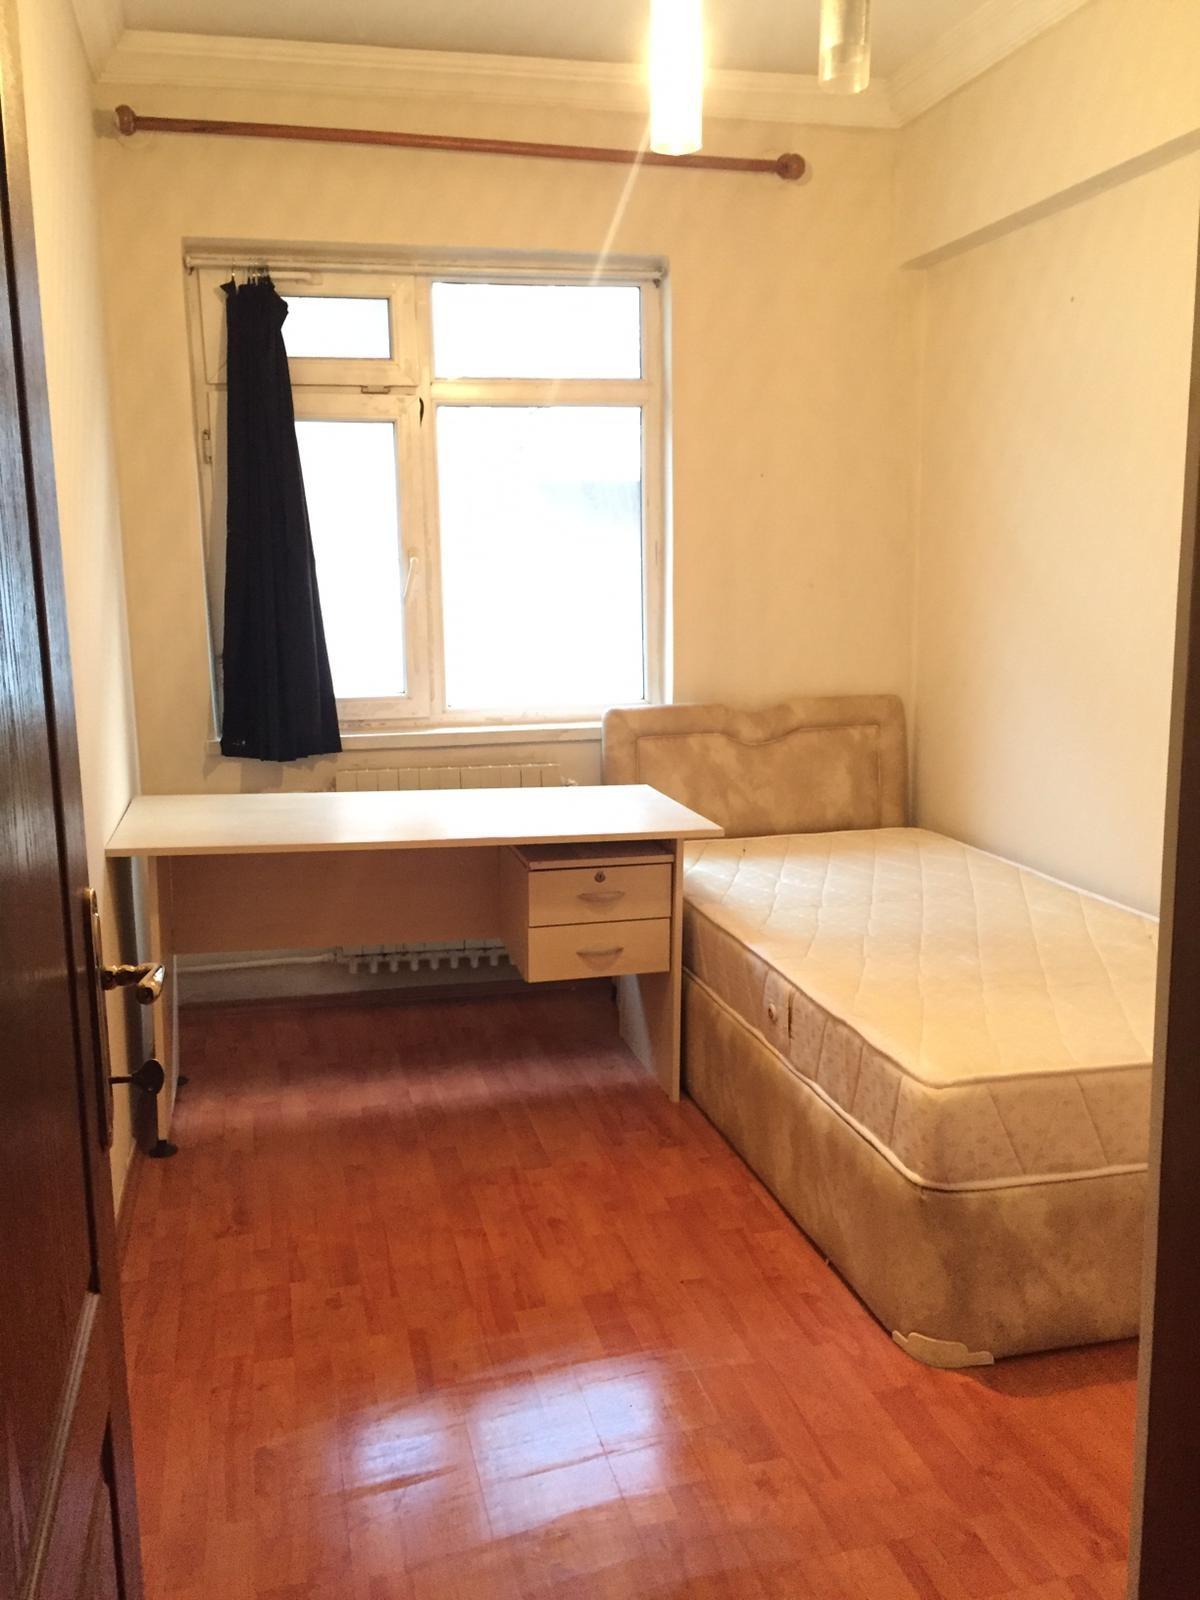 available usefull room in ankara central kızılay merkez